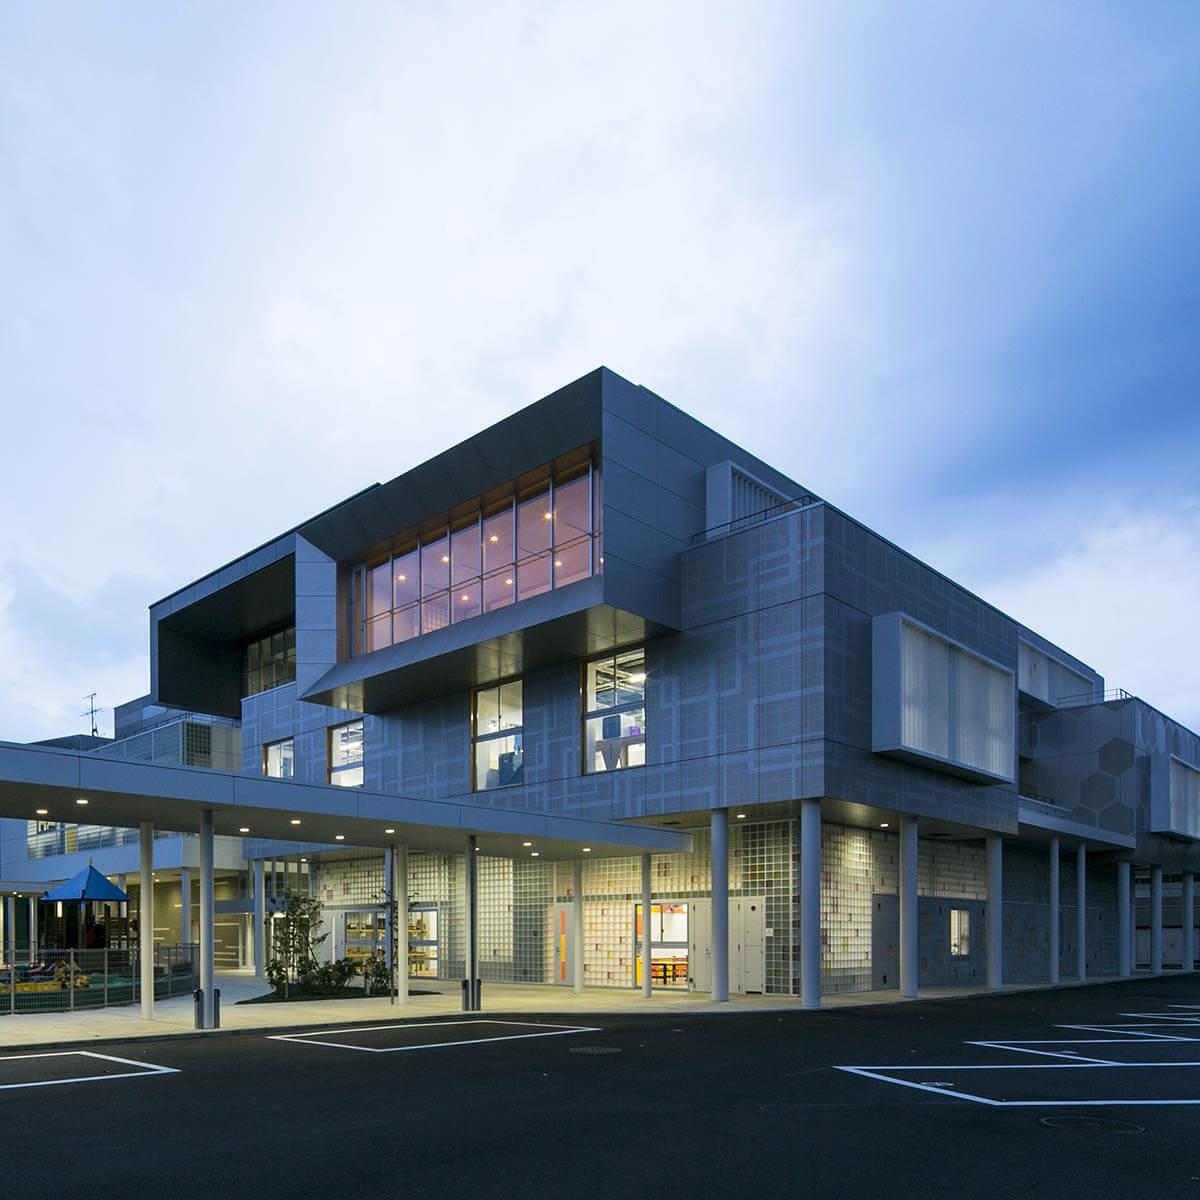 The ASIJ Creative Arts Design Center